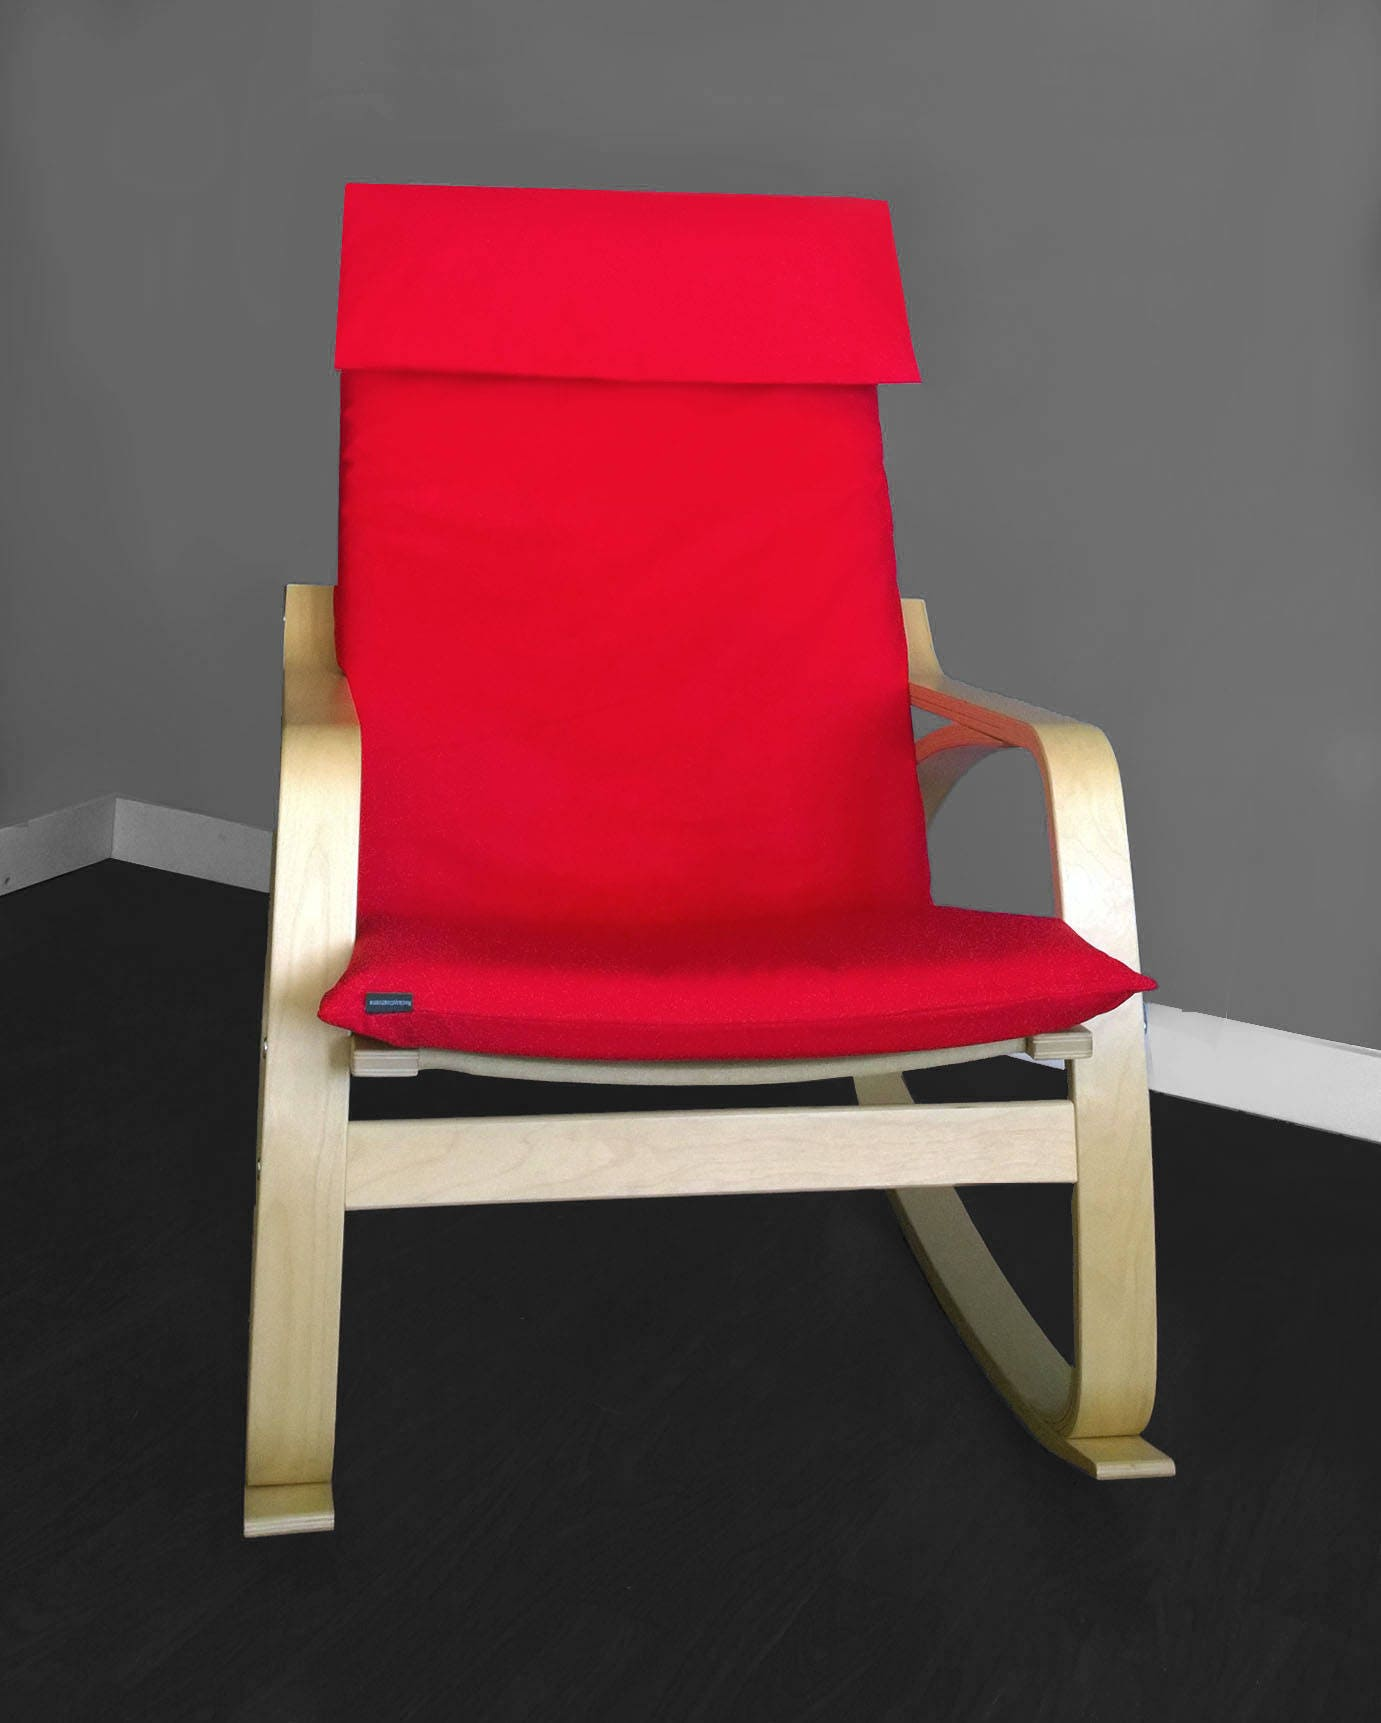 good coussin rouge ikea dedans housse de coussin rouge ikea pong prt expdier with coussin rouge ikea. Black Bedroom Furniture Sets. Home Design Ideas